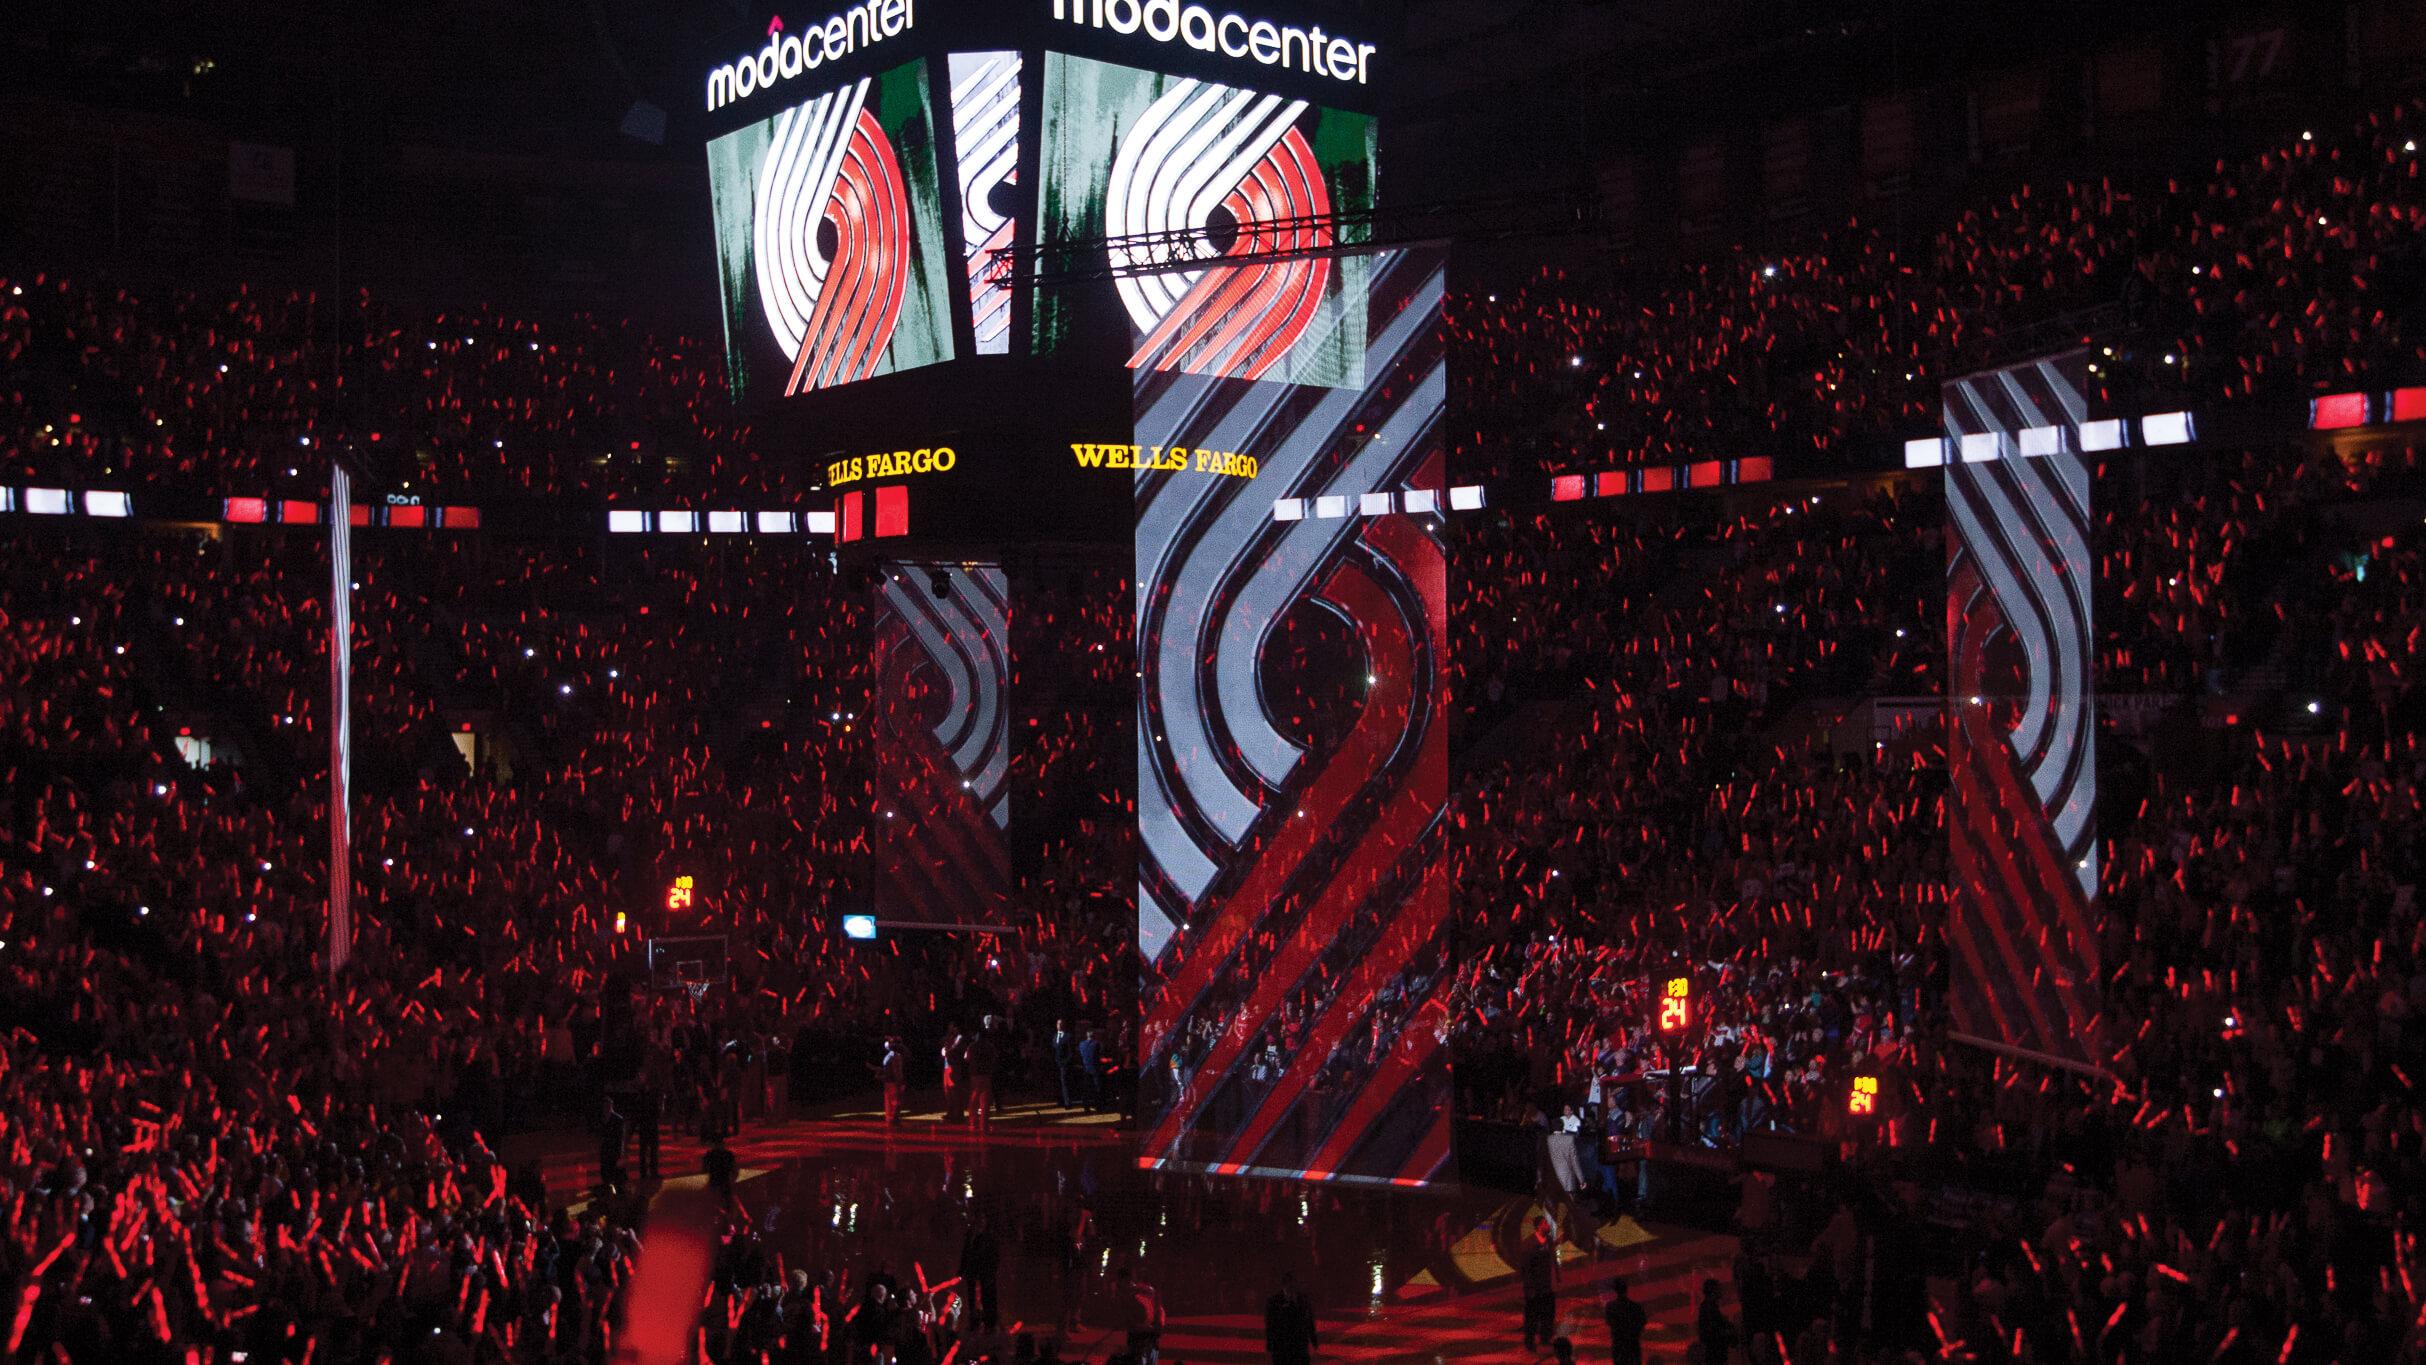 Moda Center Rose Garden Portland Trailblazers NBA Arenas & Venues Ticketmaster